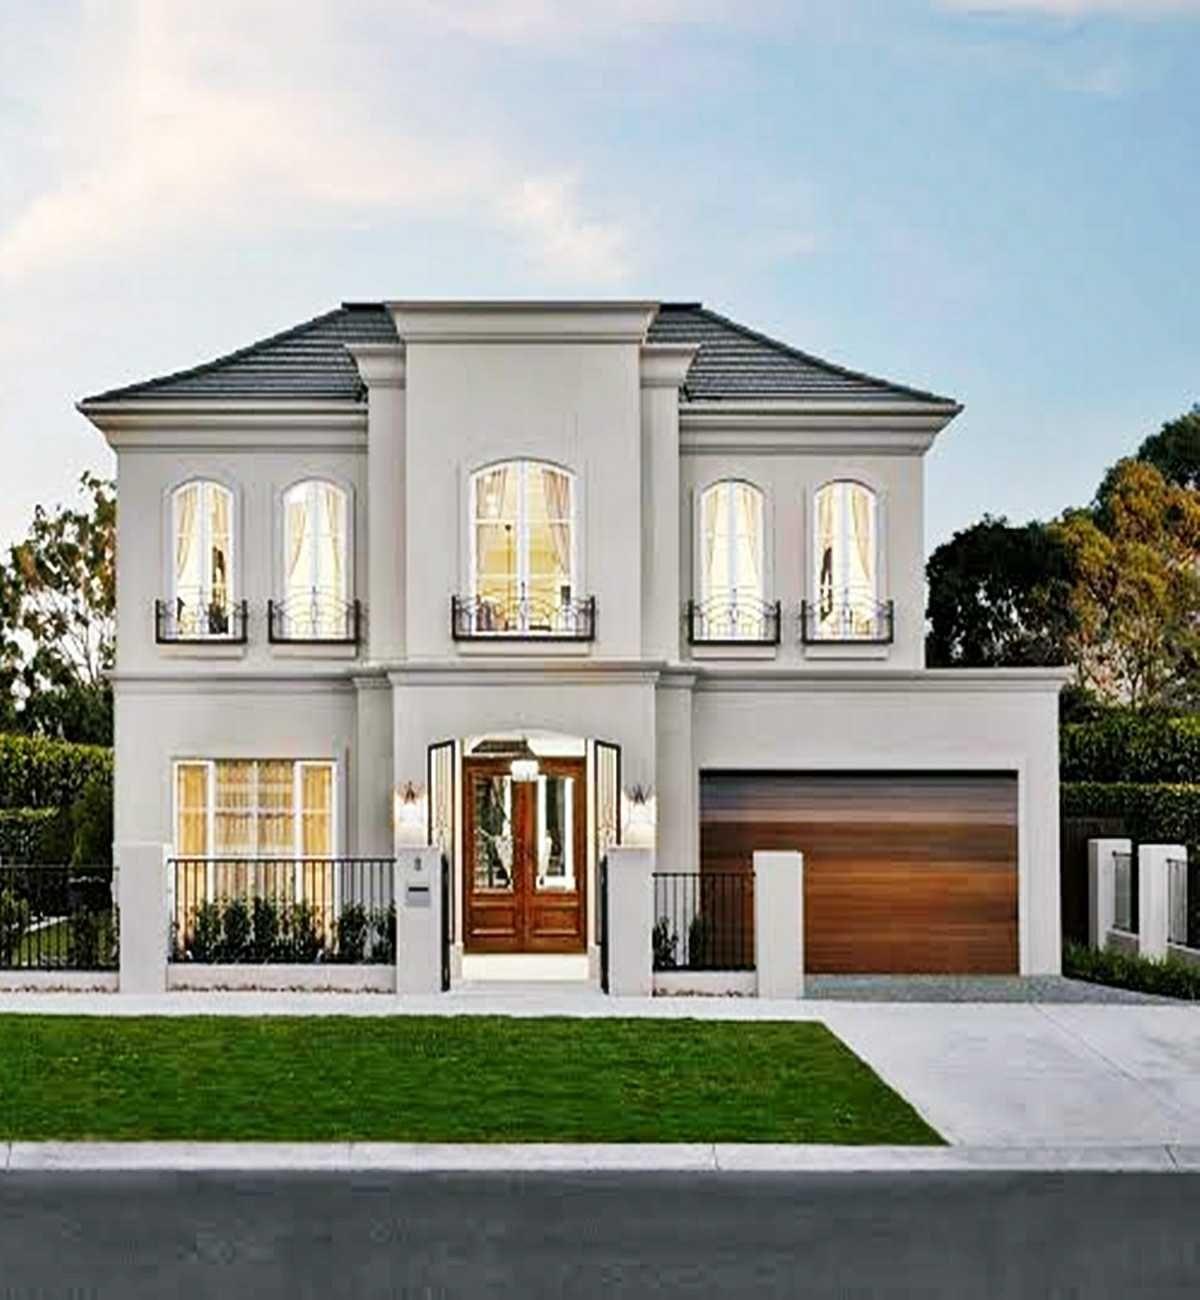 Home Design Ideas Exterior Photos: Best Scandinavian Style Home Exterior Design